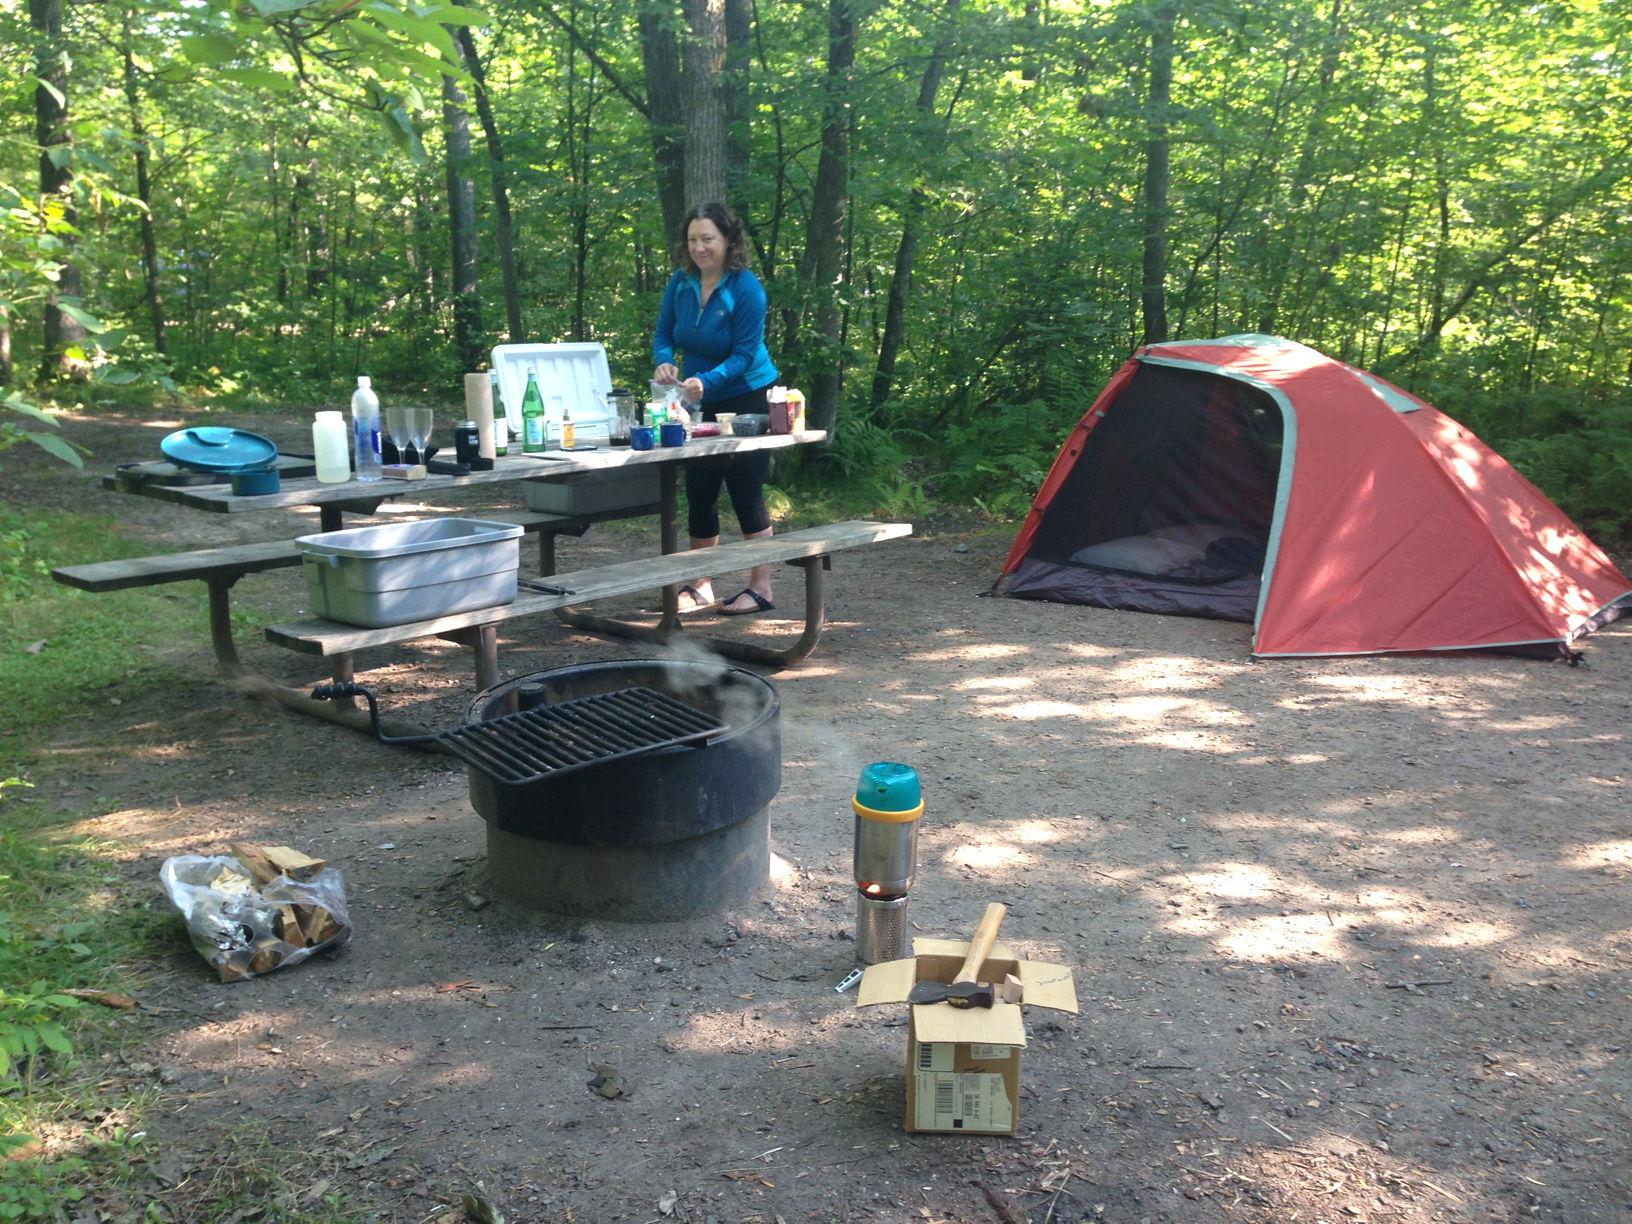 wpid-CampsiteinItascaSPsmall-2014-08-14-22-54.jpg